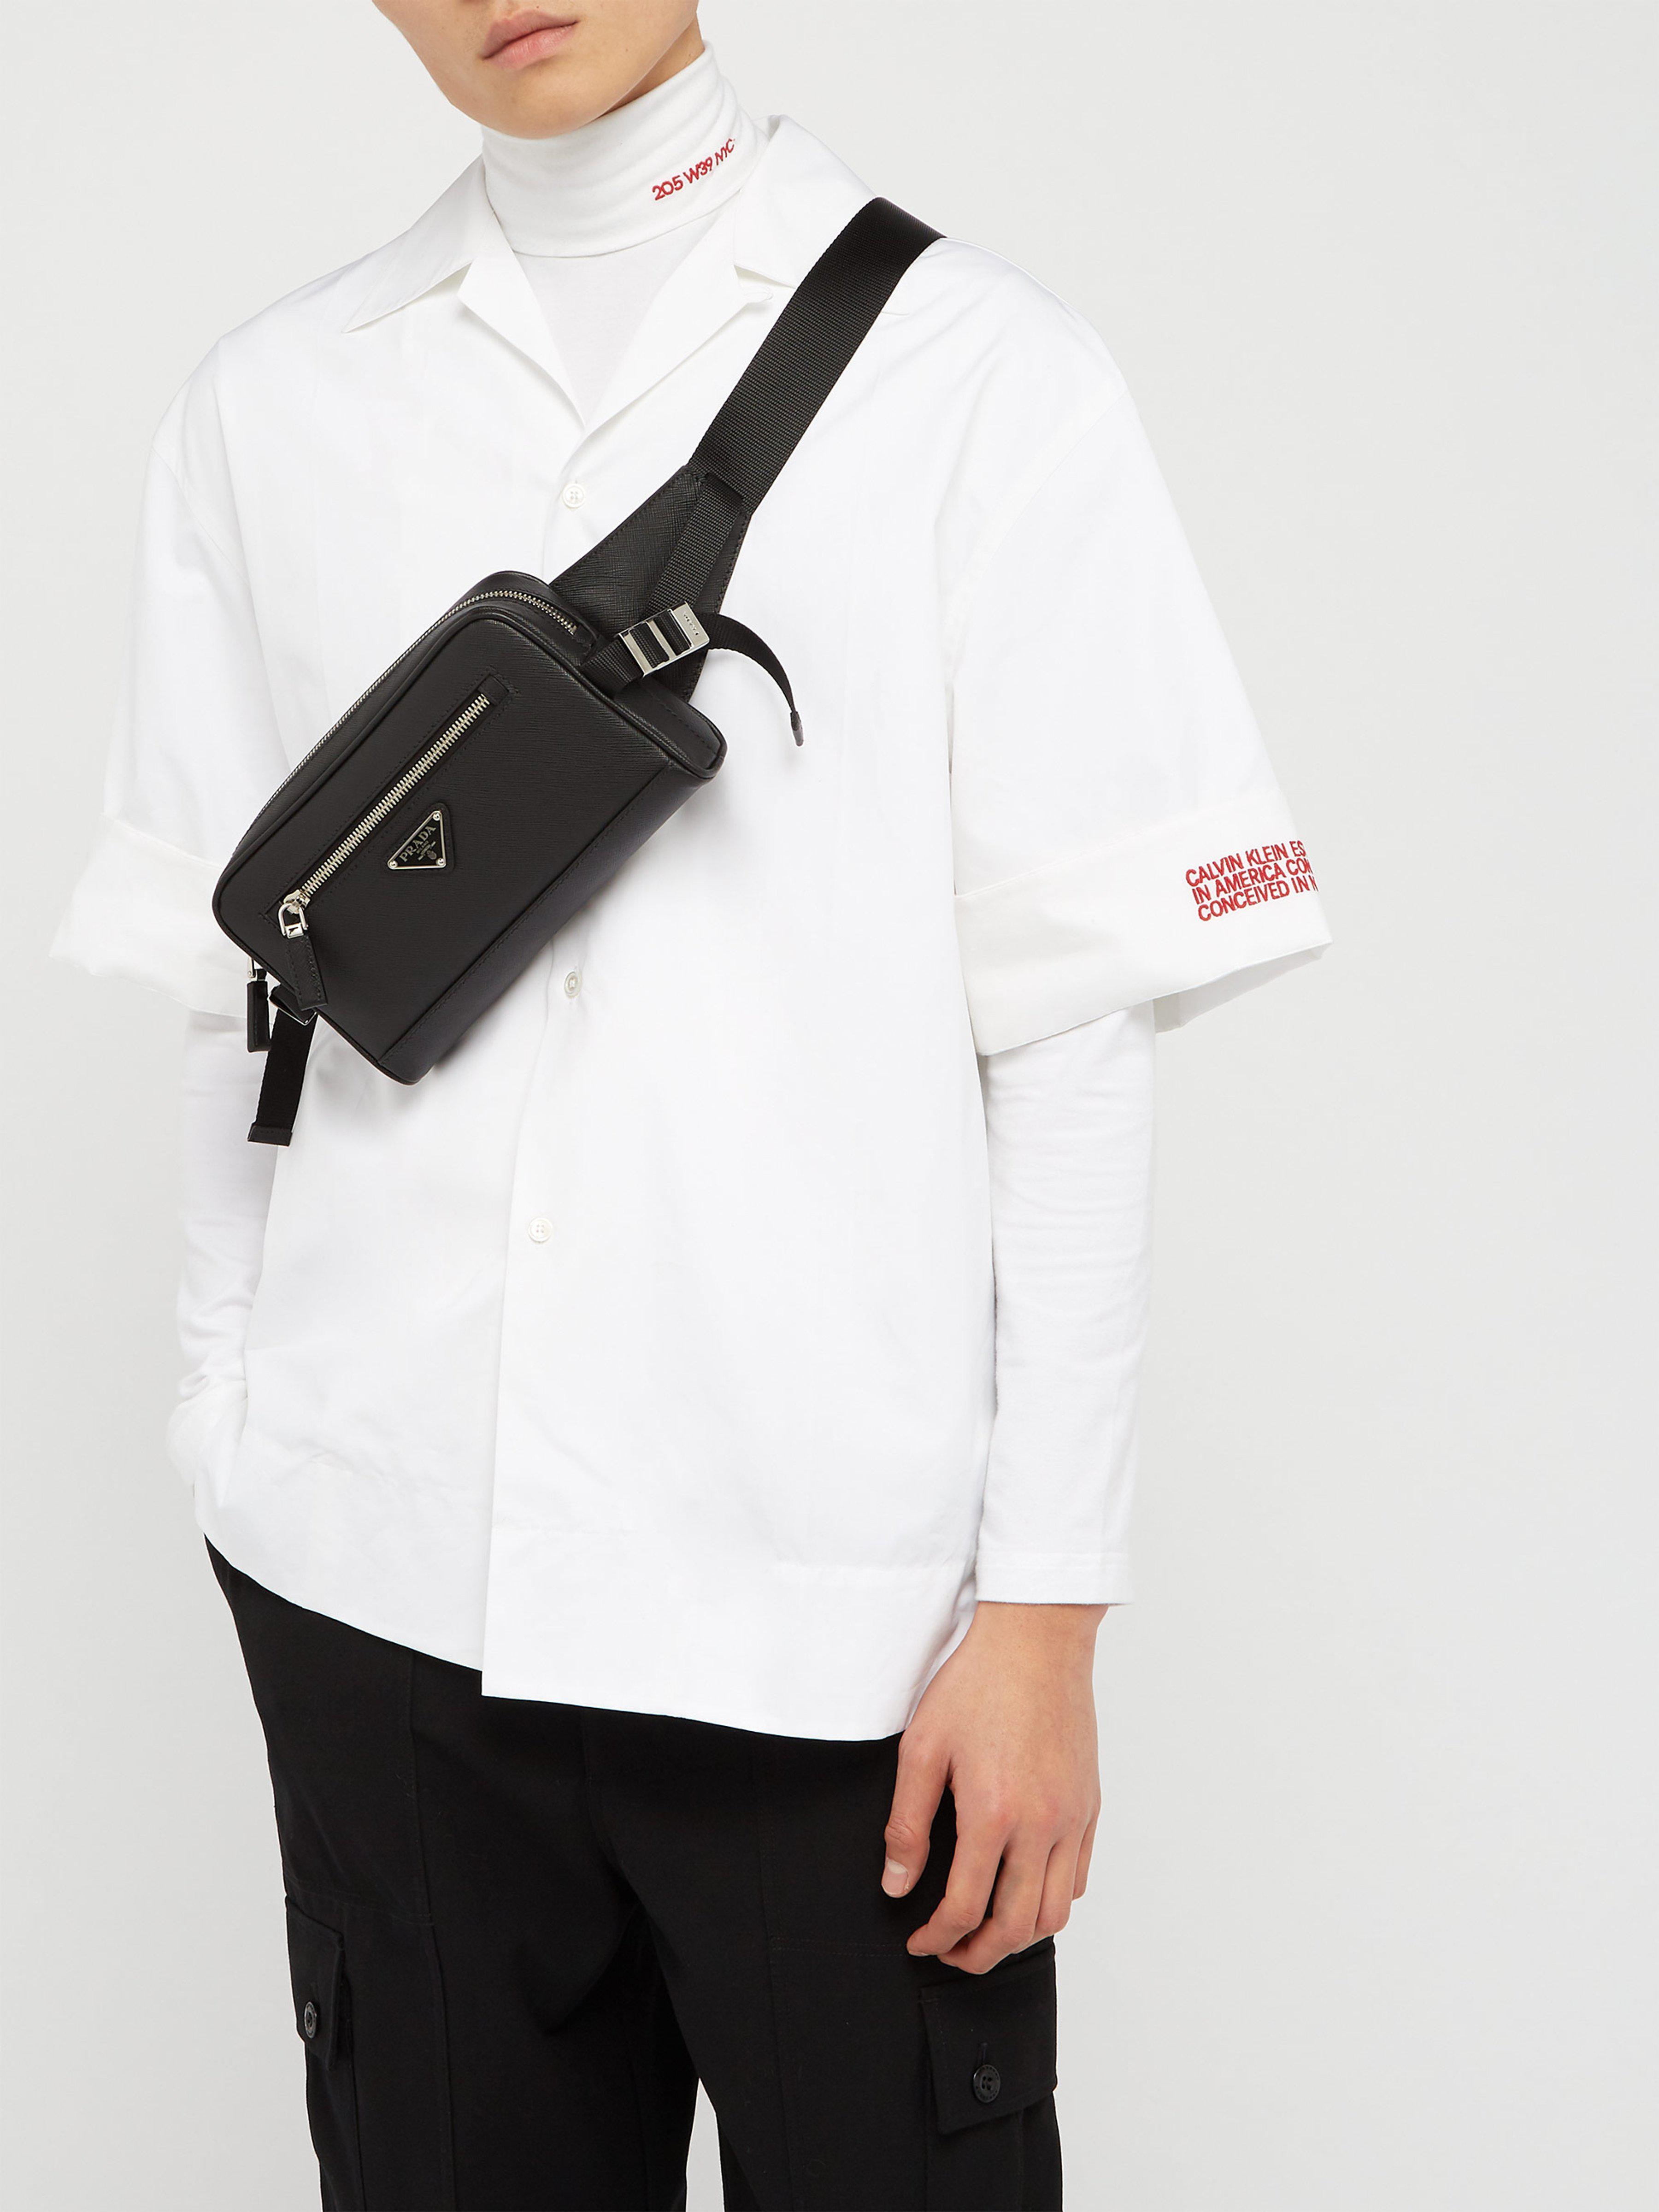 d5e9e94d15 Prada Saffiano Leather Belt Bag in Black for Men - Lyst